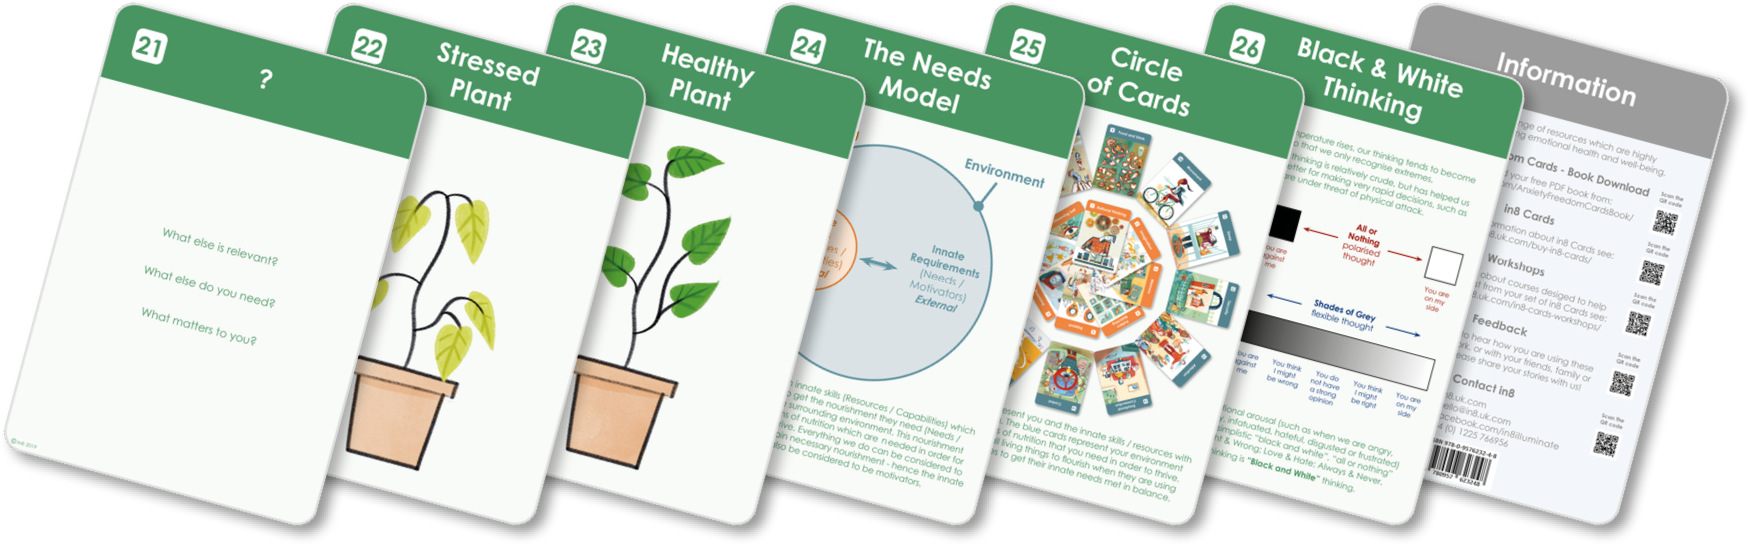 Seven information cards